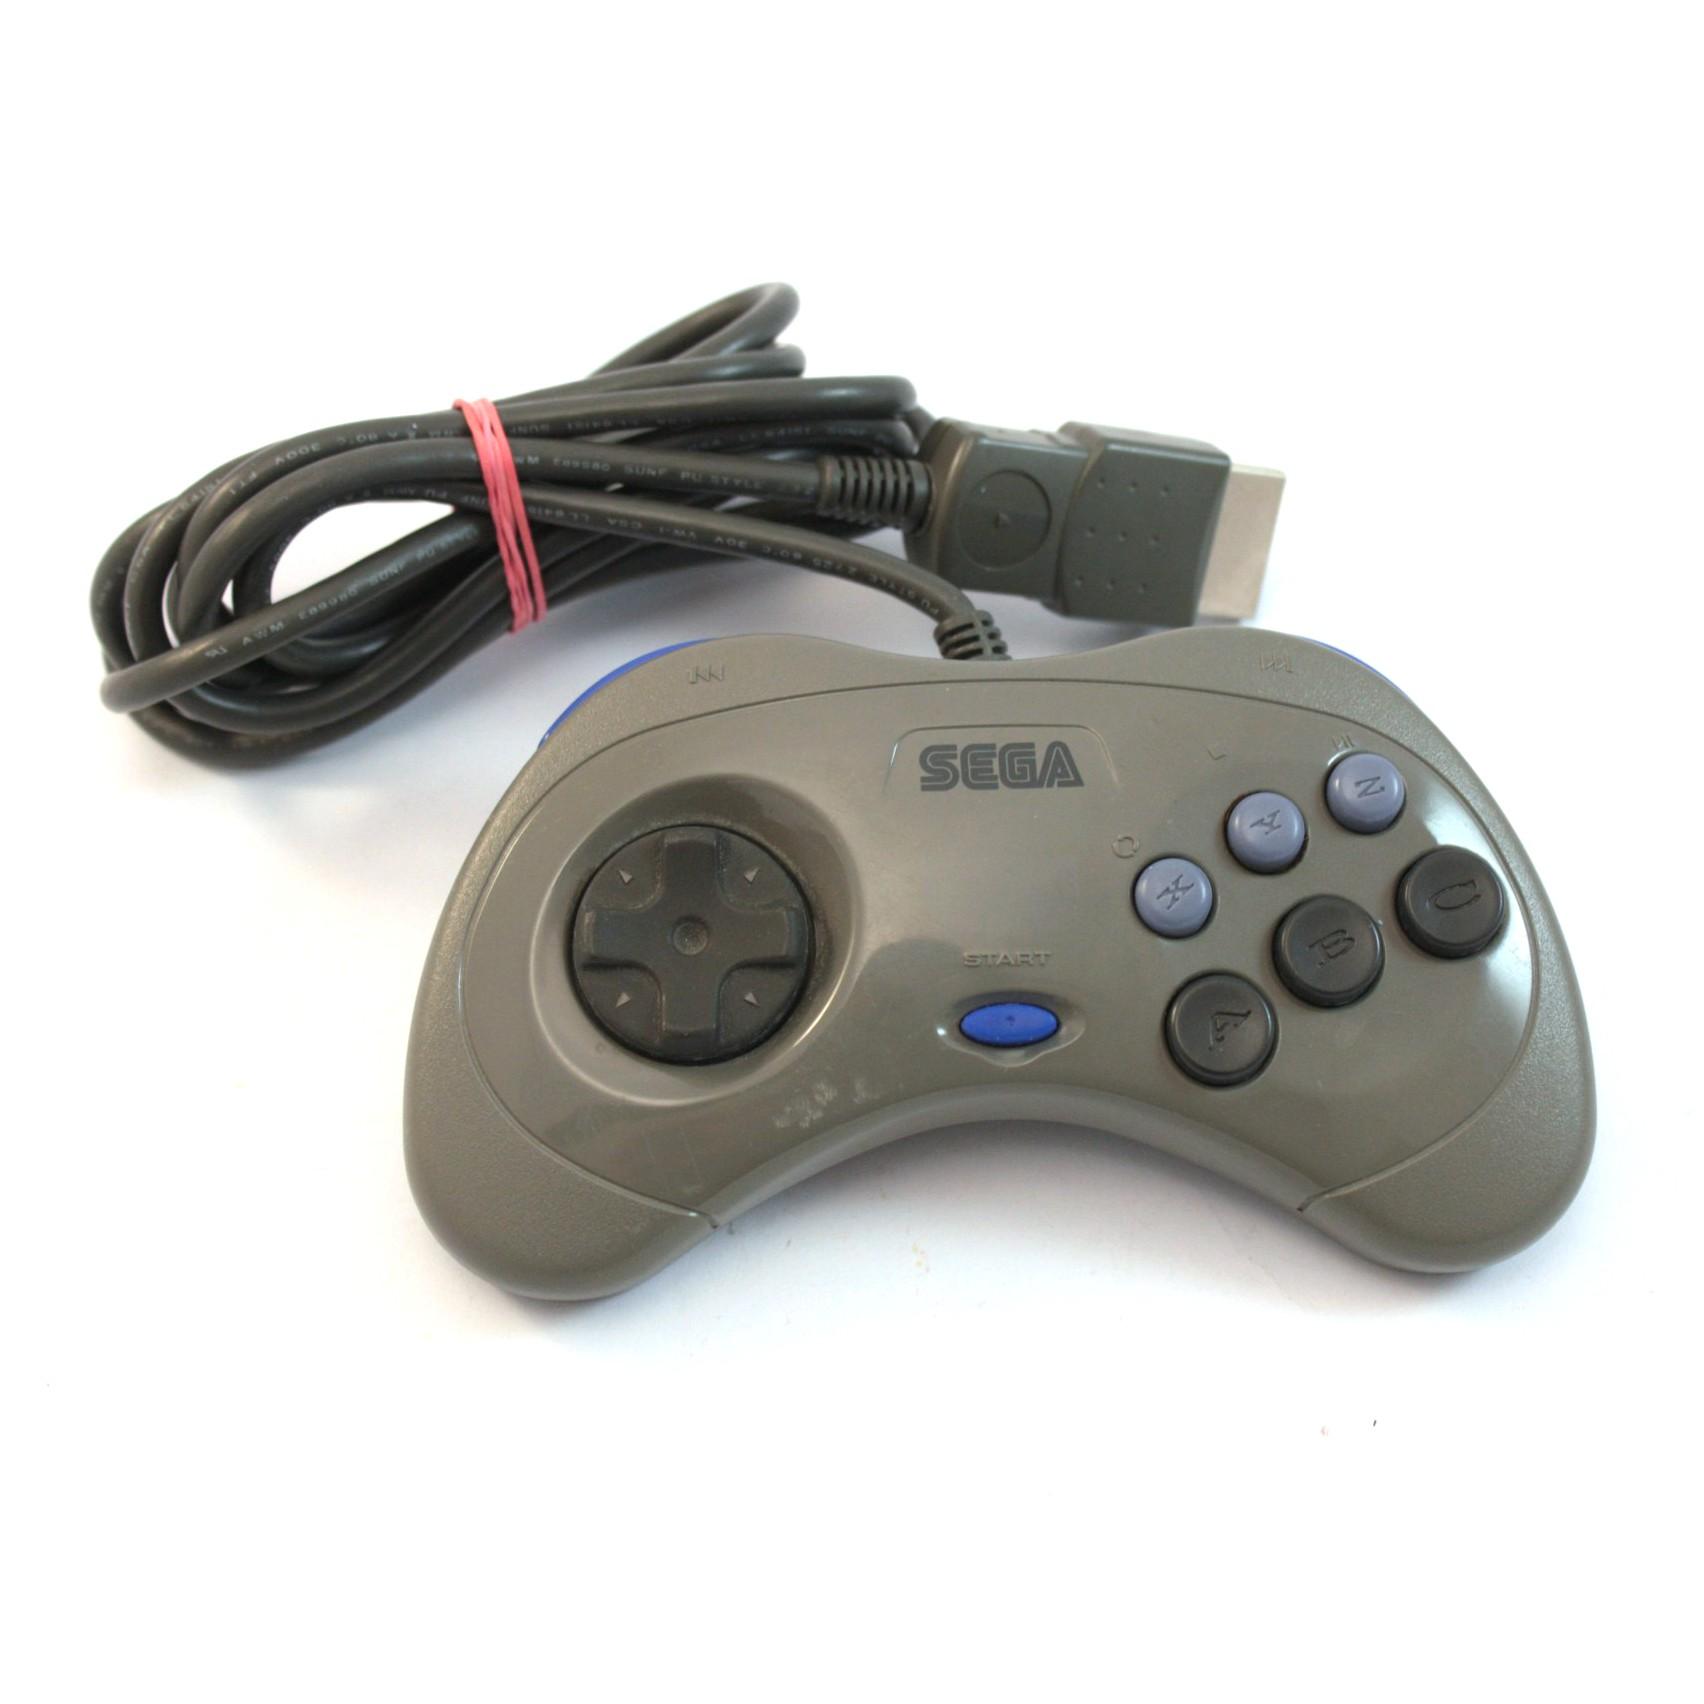 Original Controller / Control Pad HSS-0101 #grau [Sega]